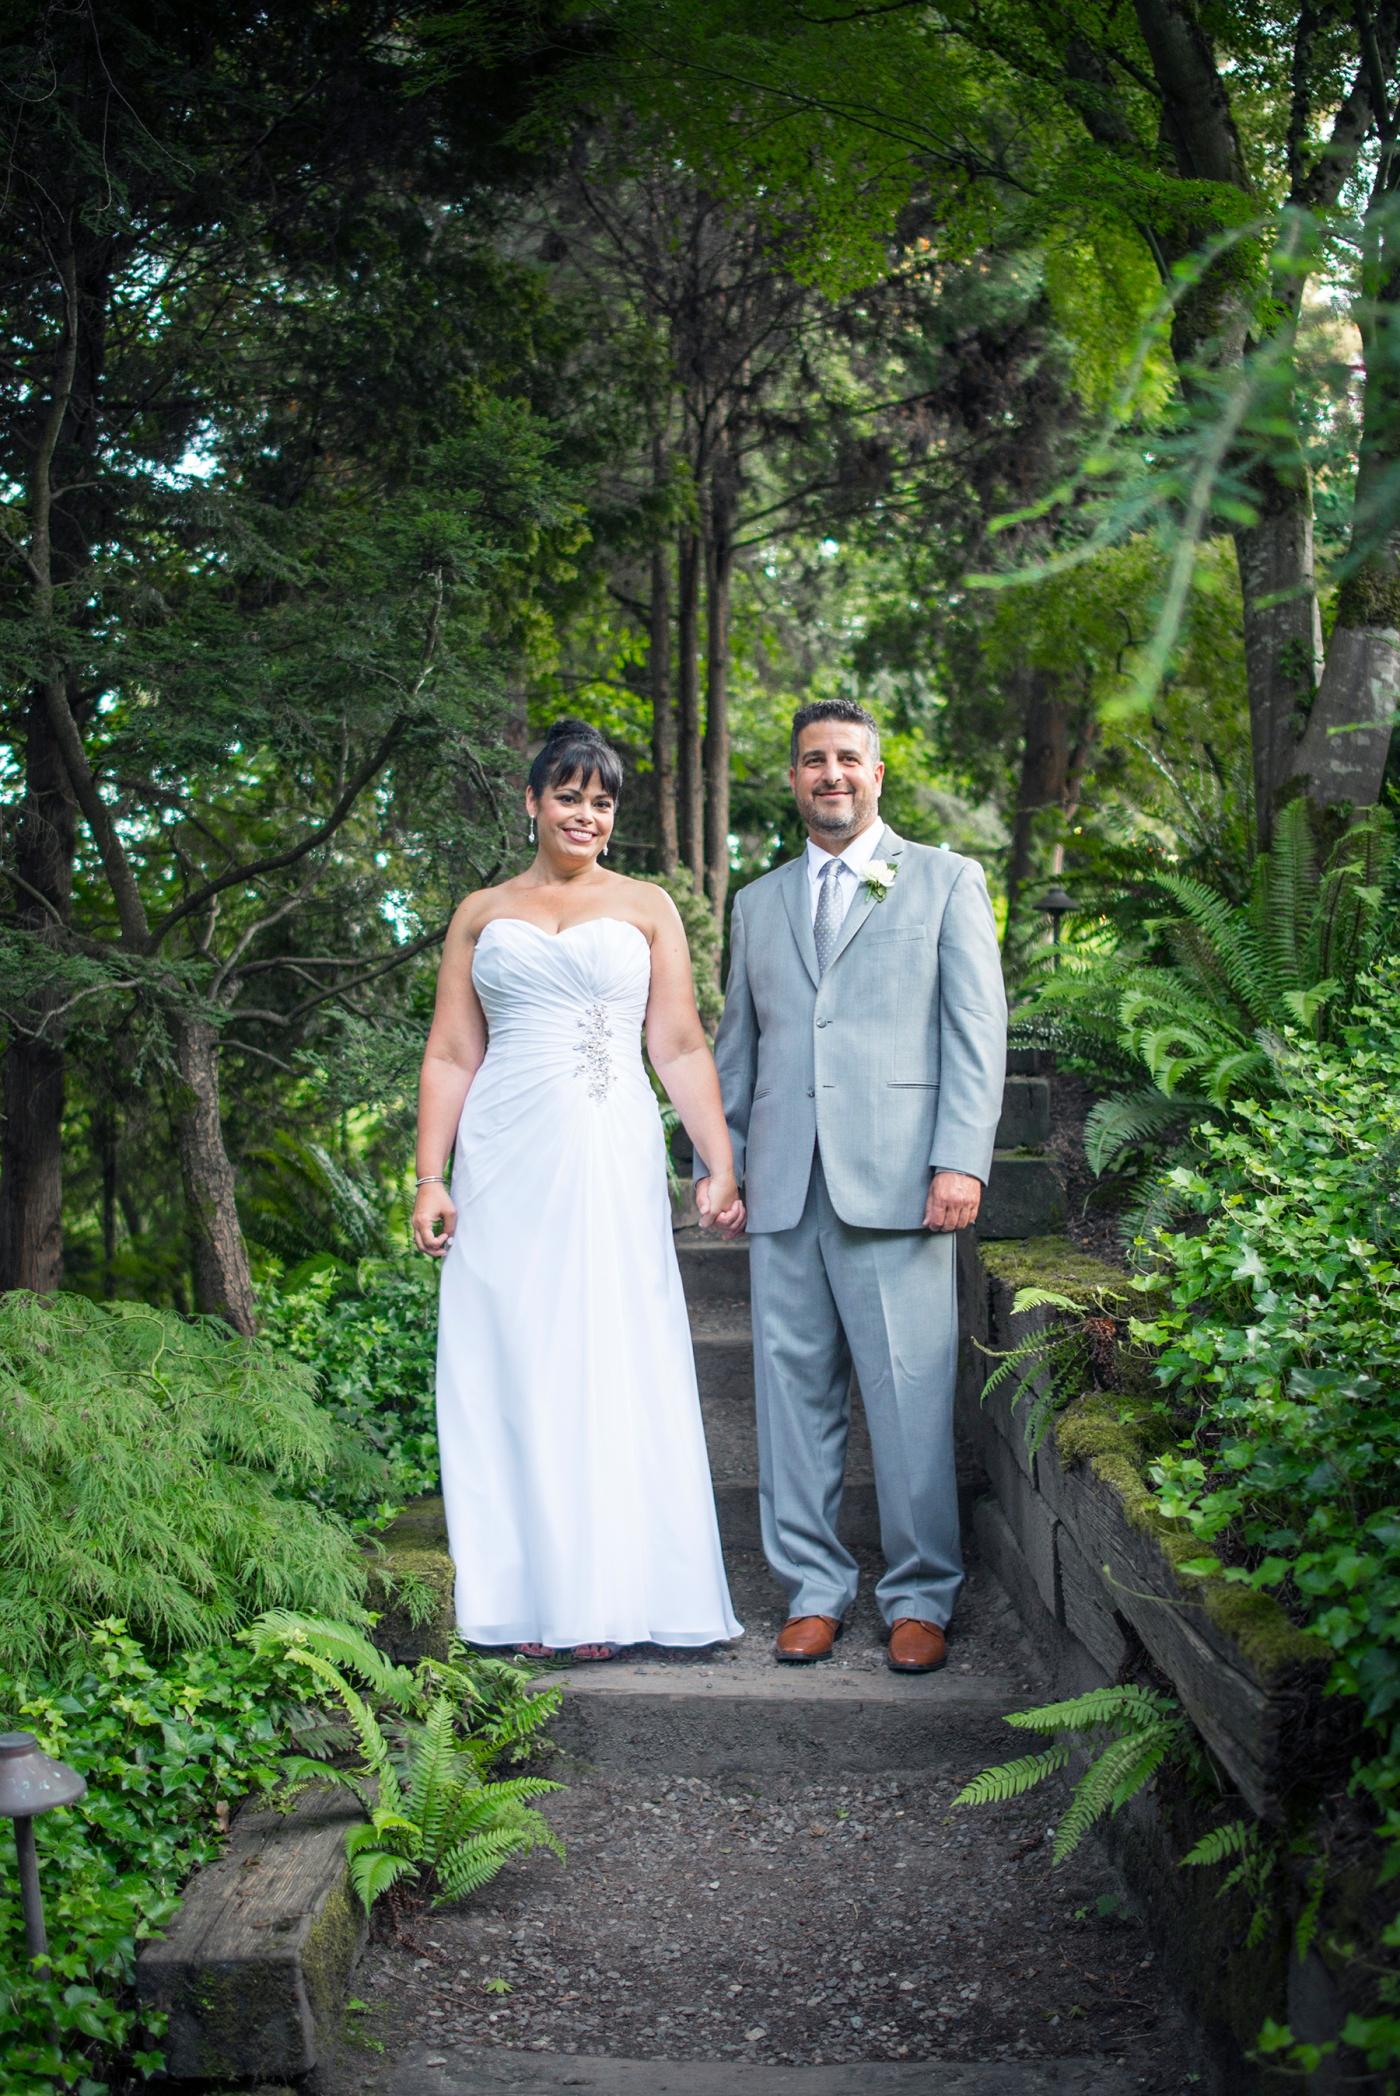 ang_matt_jm_woodinville_2016_js_photography_weddingdsc_3119